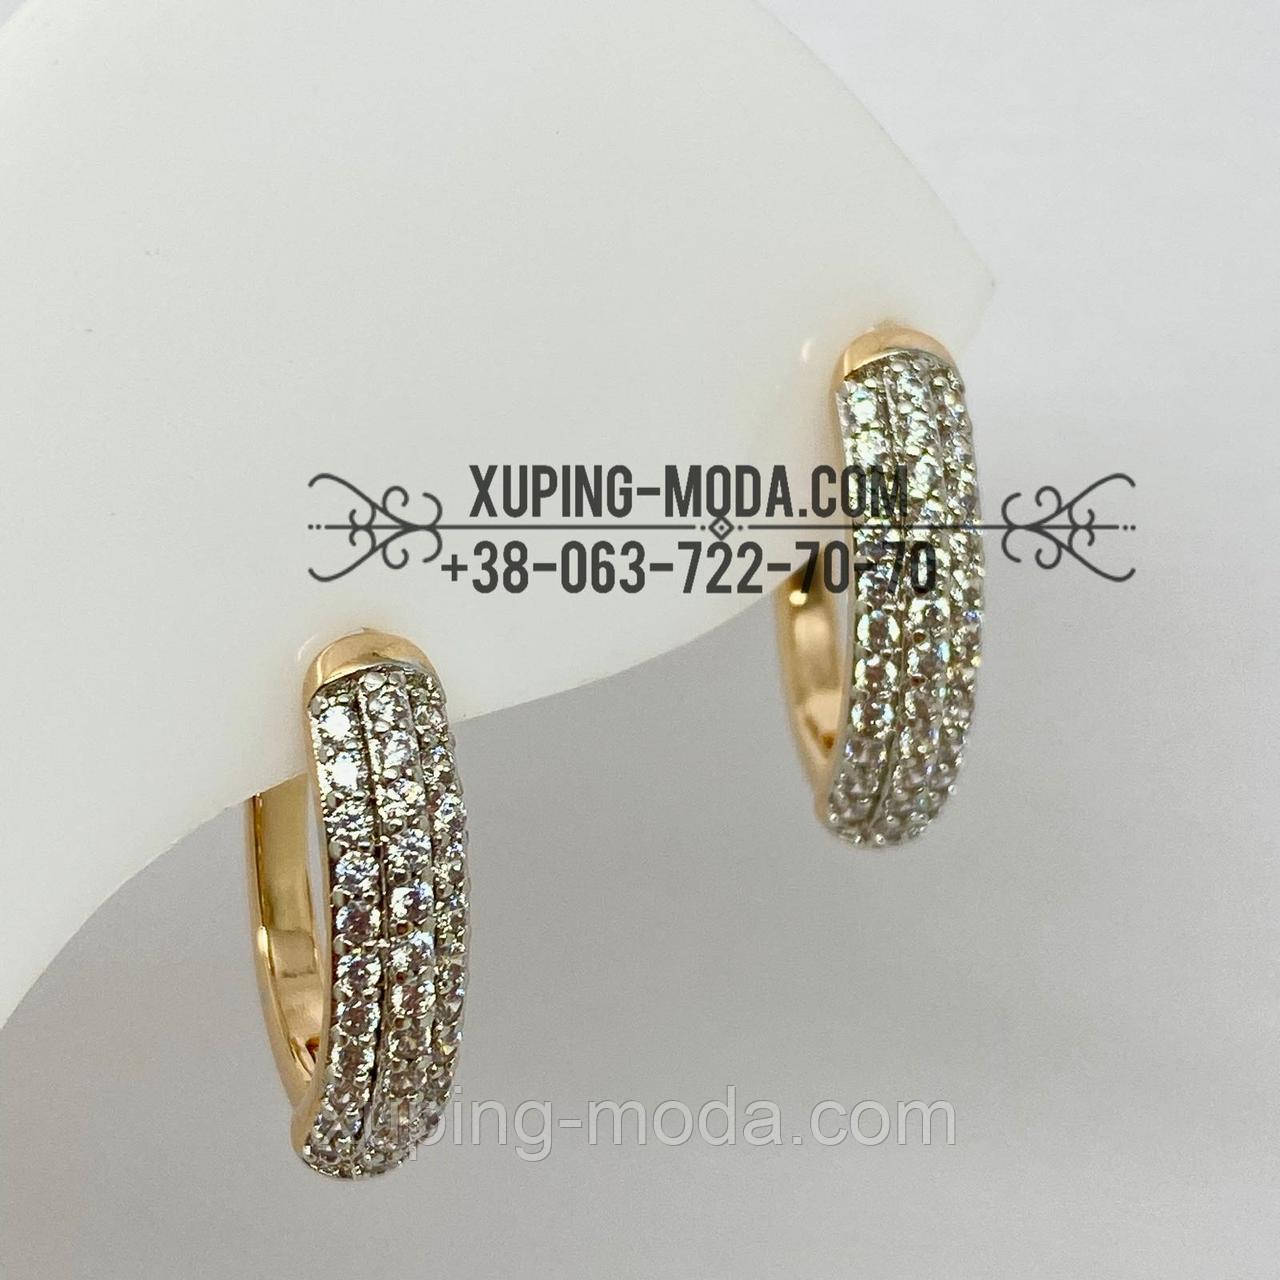 Серьги по низкой цене. Xuping